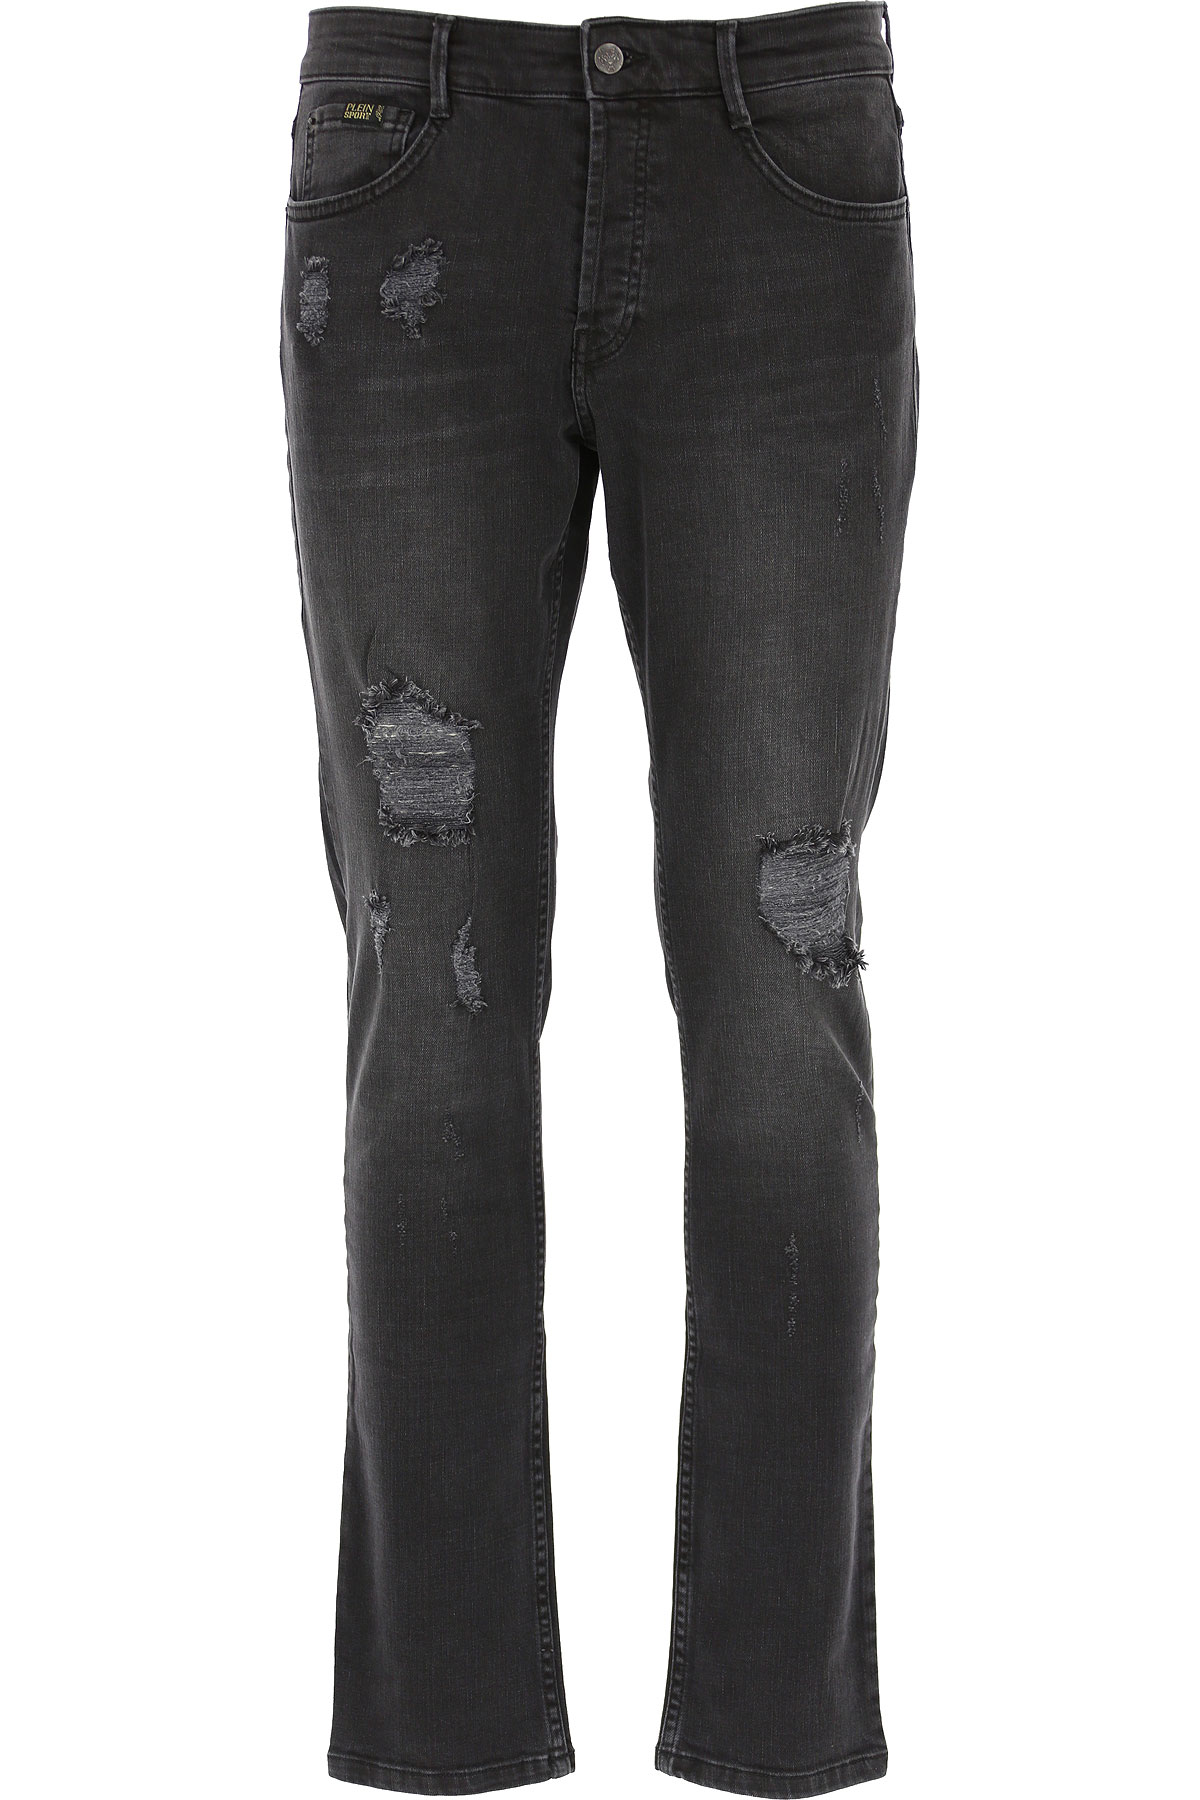 Philipp Plein Jeans On Sale, Black, Cotton, 2019, 31 32 33 34 36 38